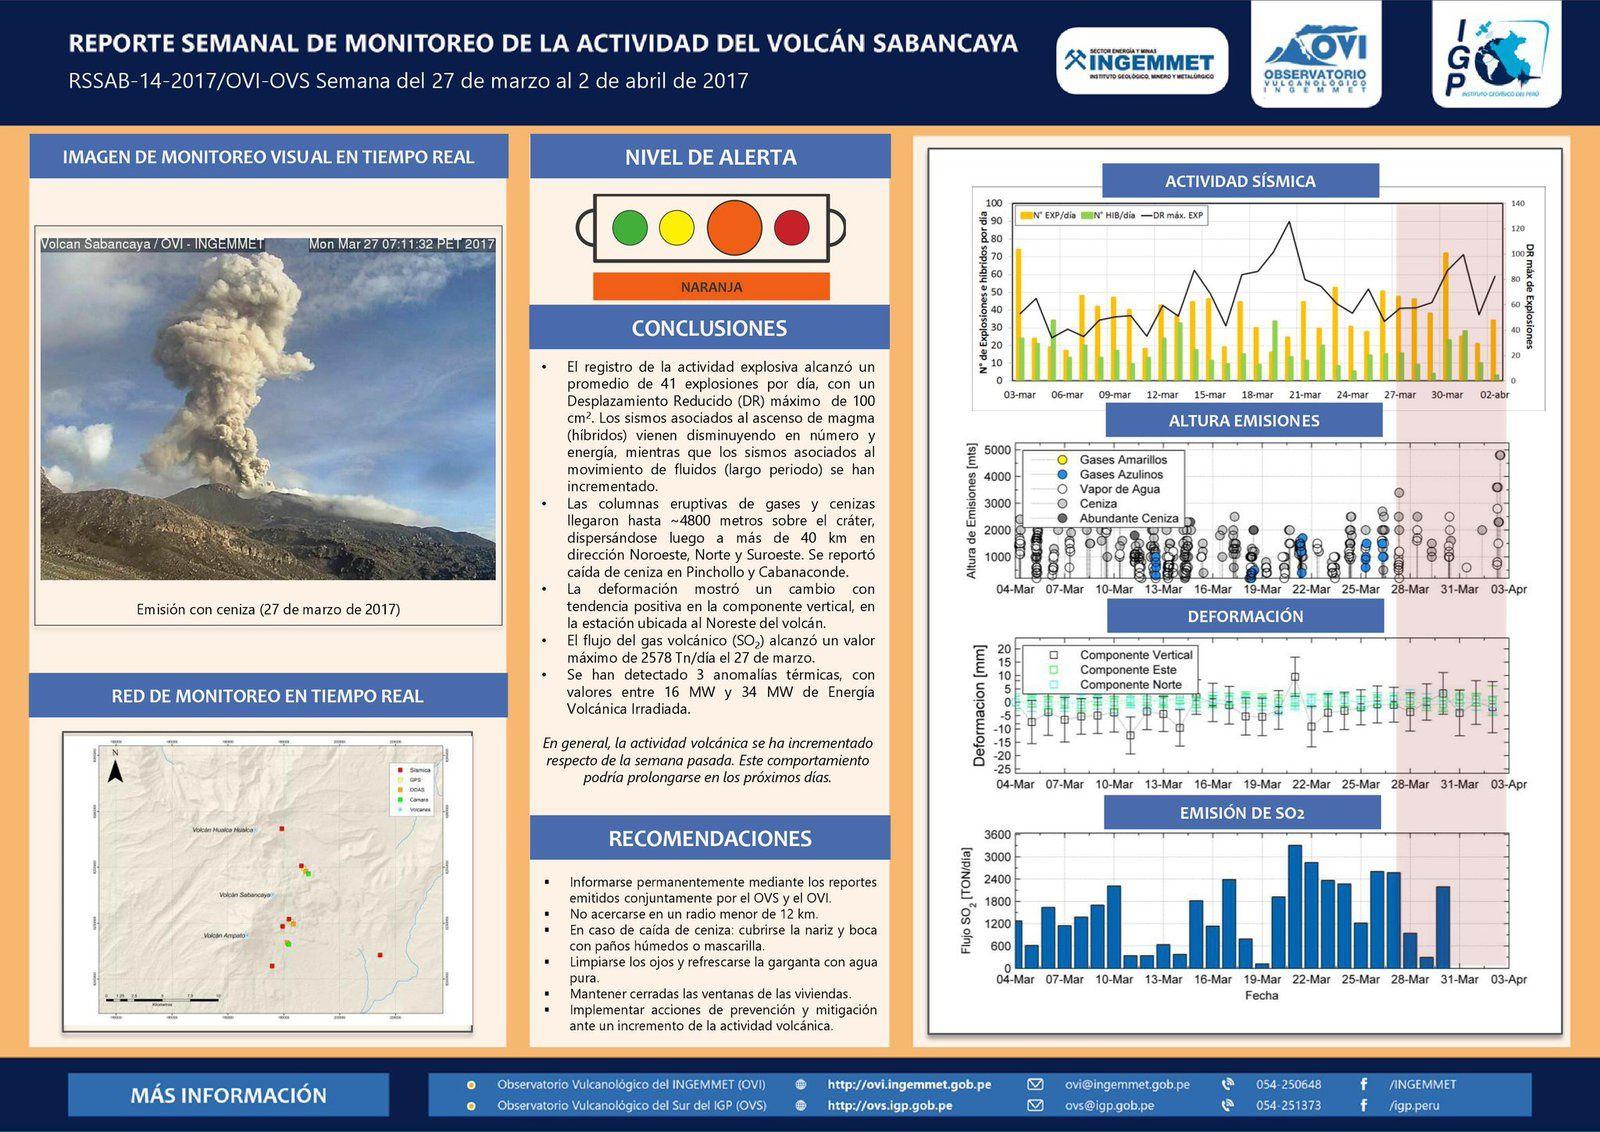 Sabancaya - Activity report from 27 March to 2 April 2017 - Doc. OVI-Ingemmet